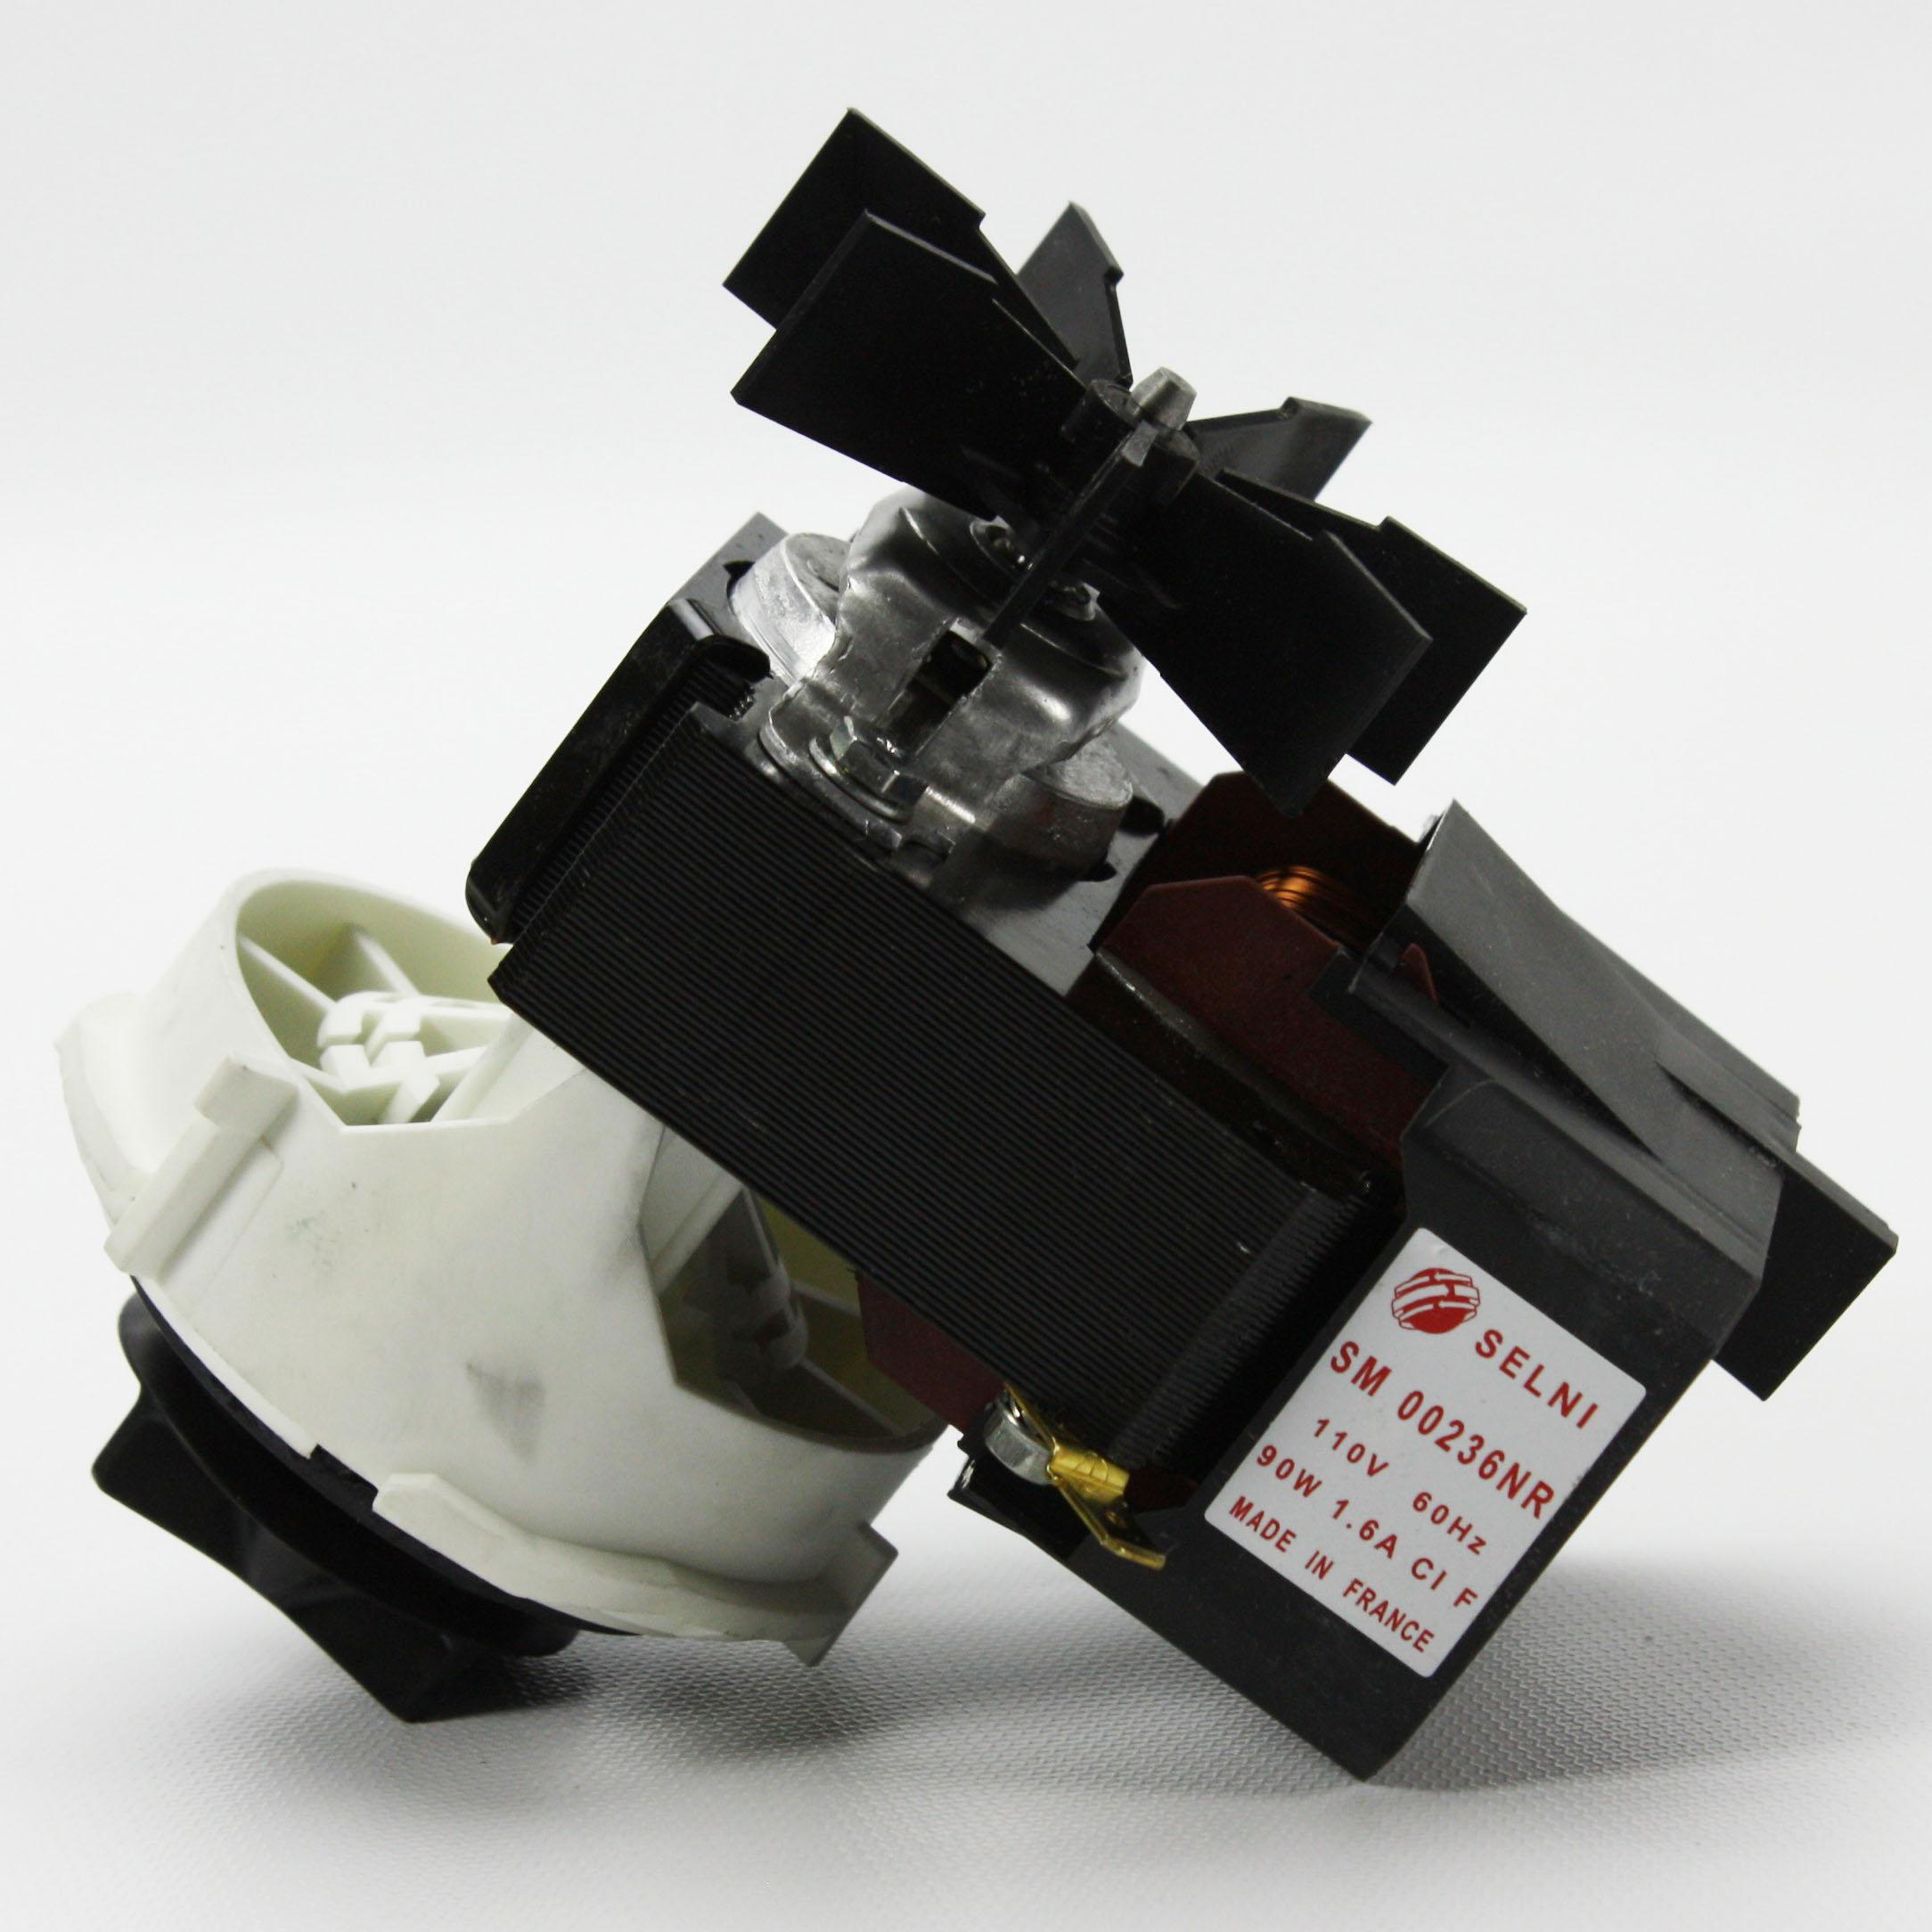 Genuine Oem 479595 420325p Fisher Paykel Washer Drain Pump